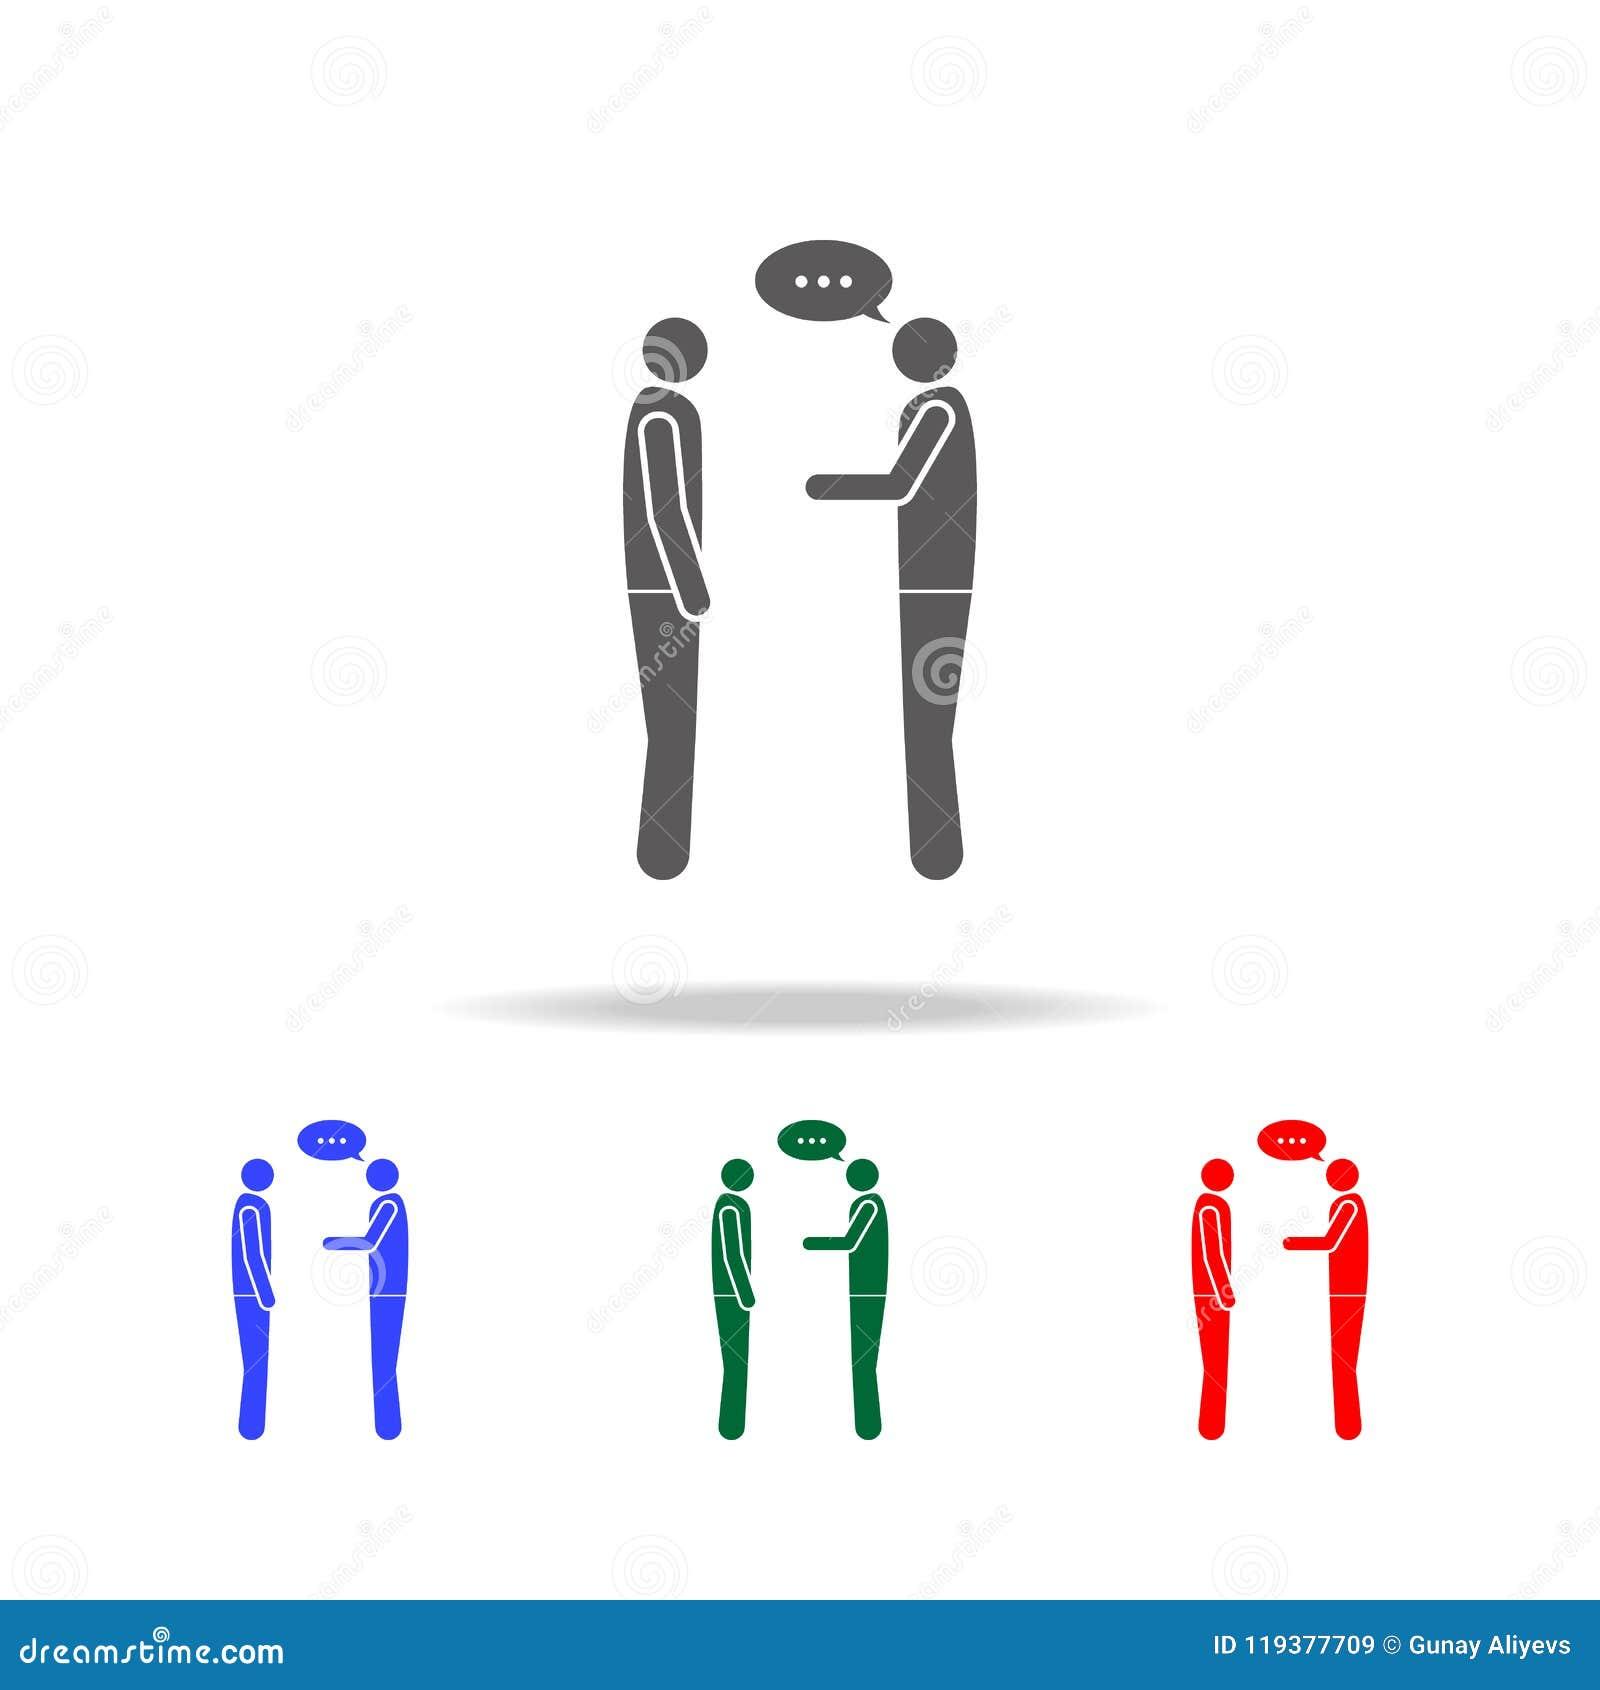 simple conversation between two people